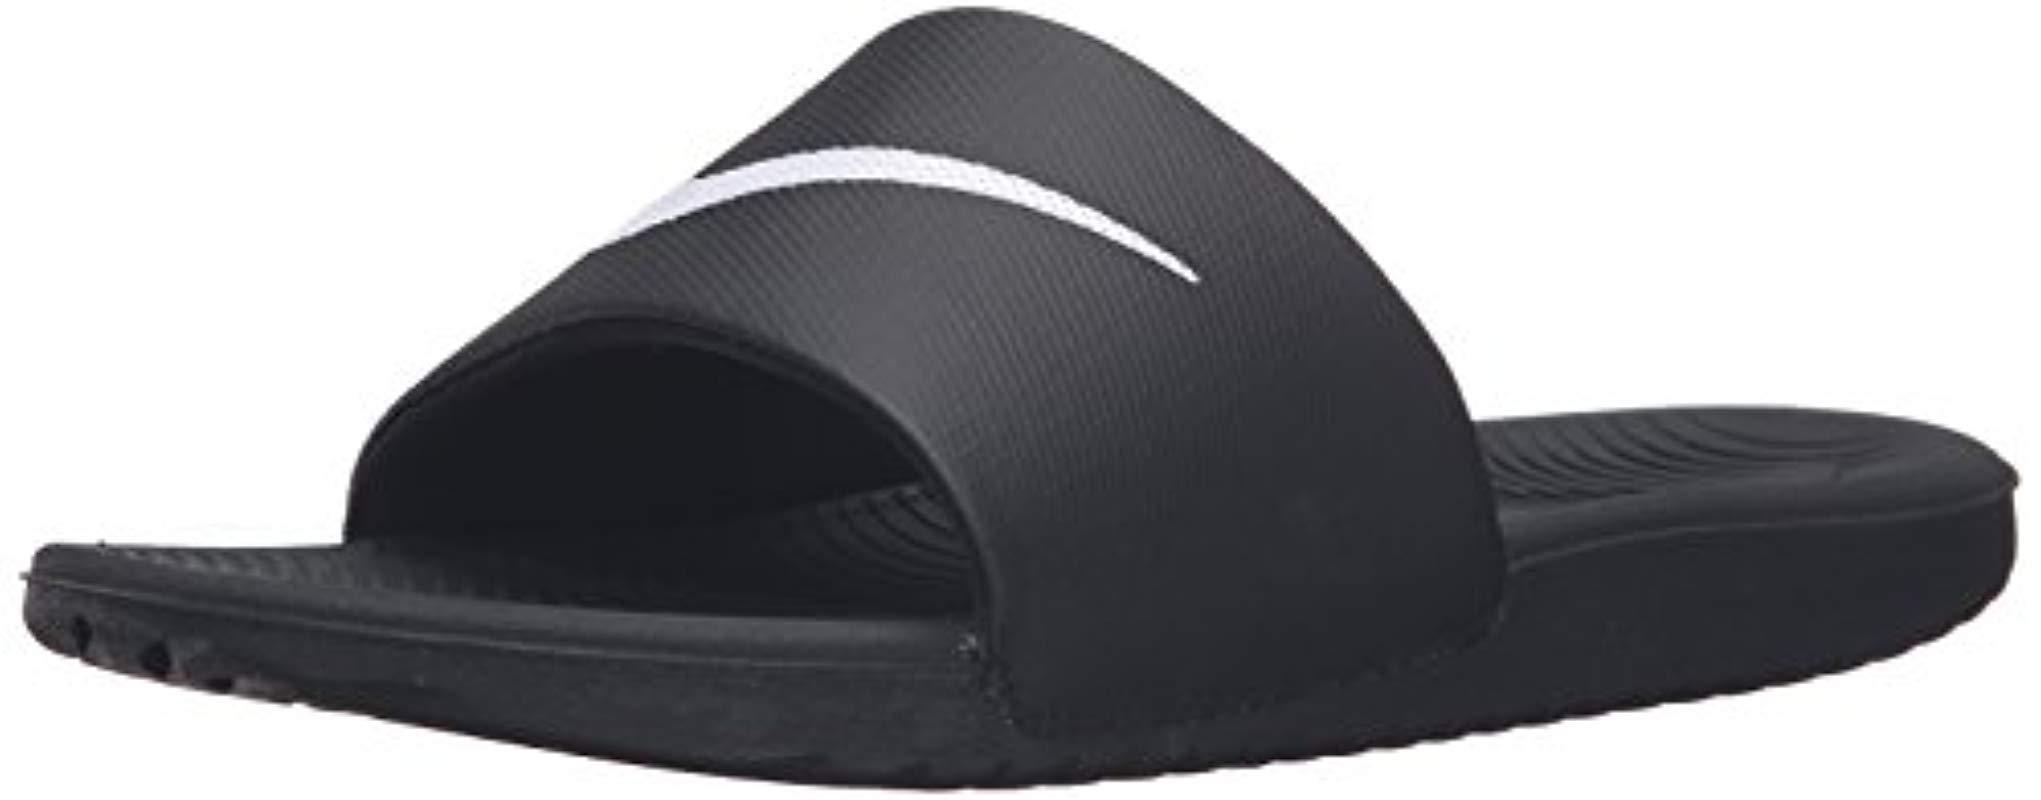 half off ab3dc a0d28 Nike - Black Kawa Slide Athletic Sandal for Men - Lyst. View fullscreen